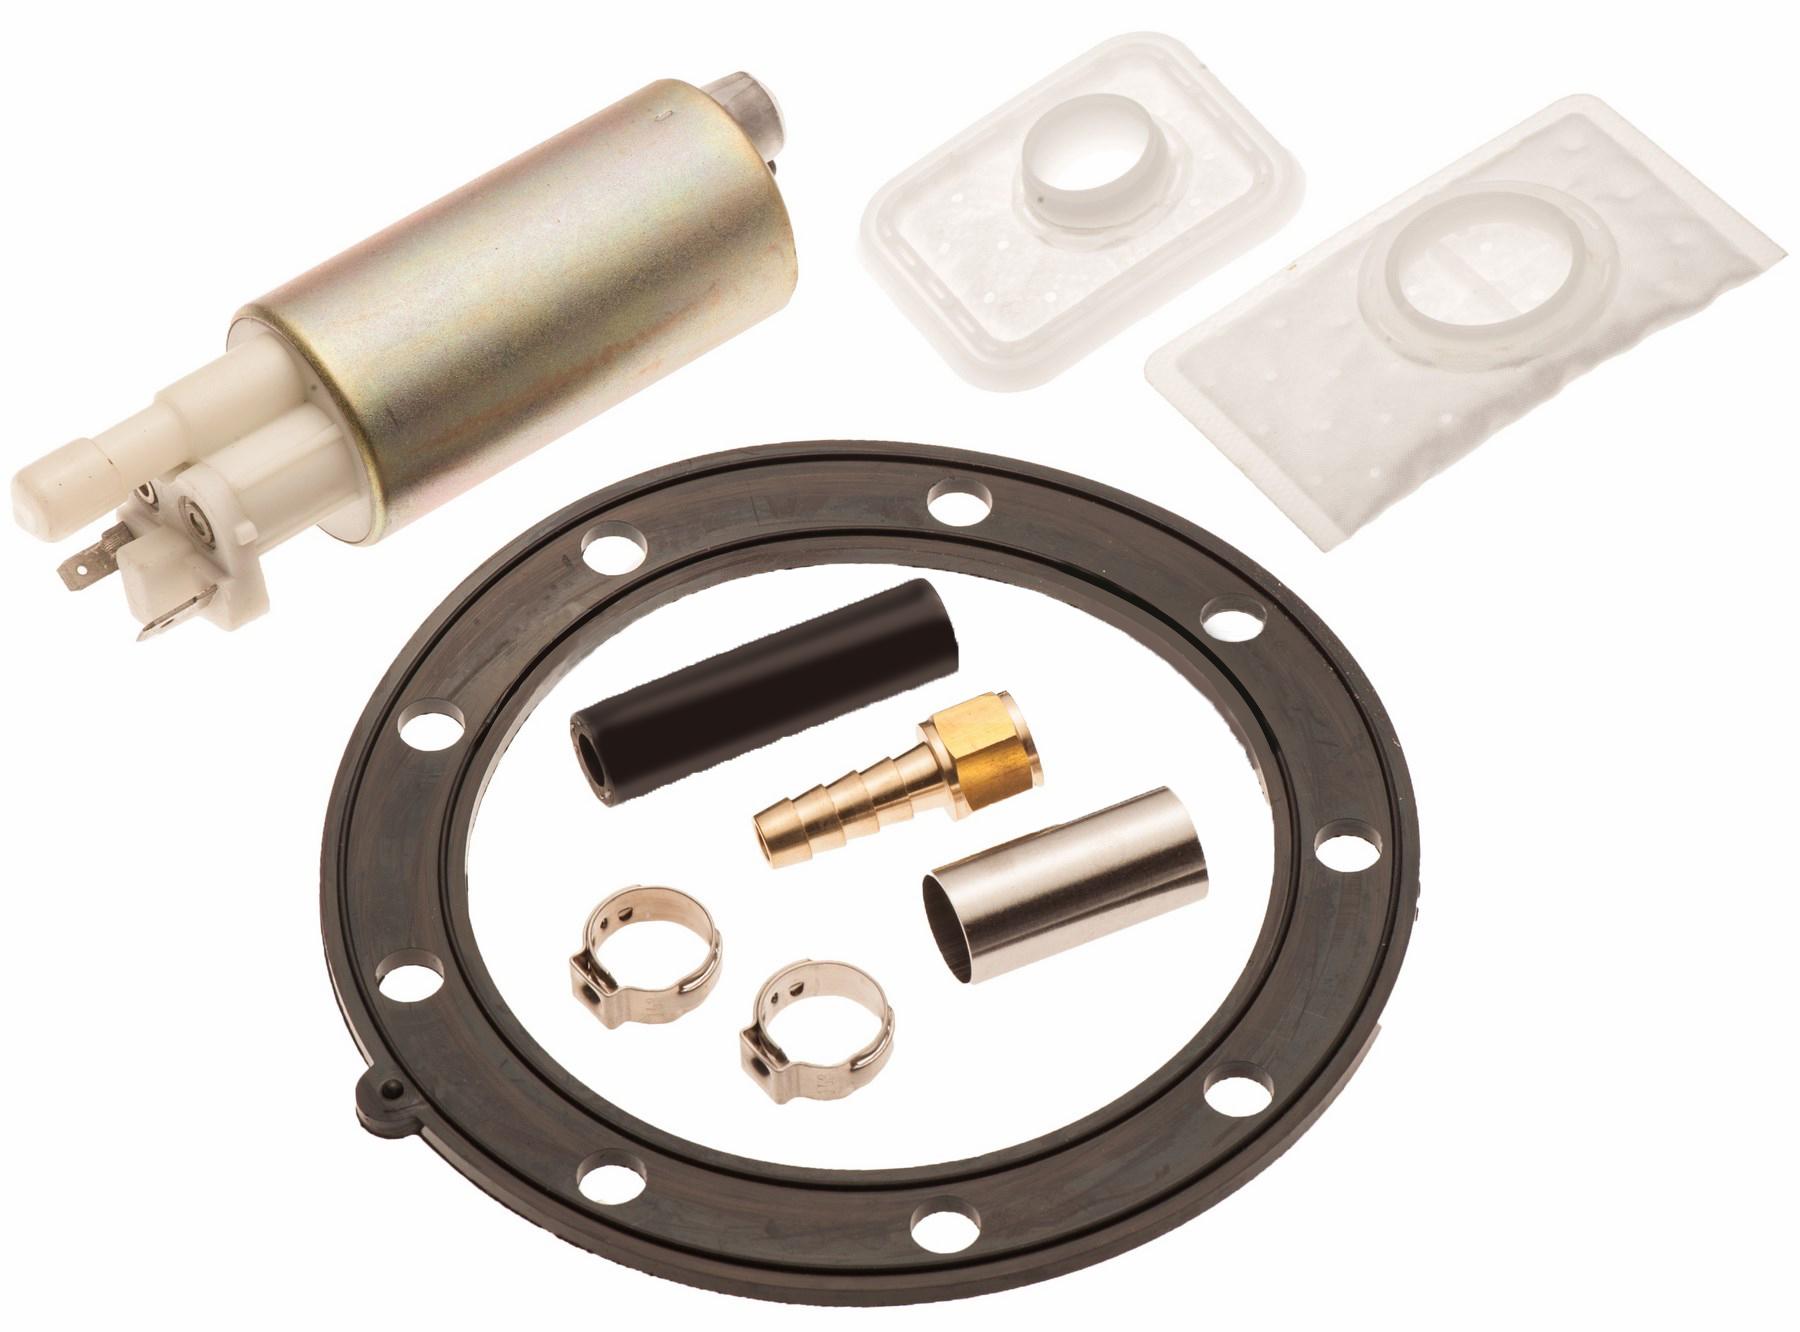 Sea Doo In Tank Fuel Pump Kit Direct Injection Gtx Xp Rx Lrv 3d Di Filter New Pwc Rebuild